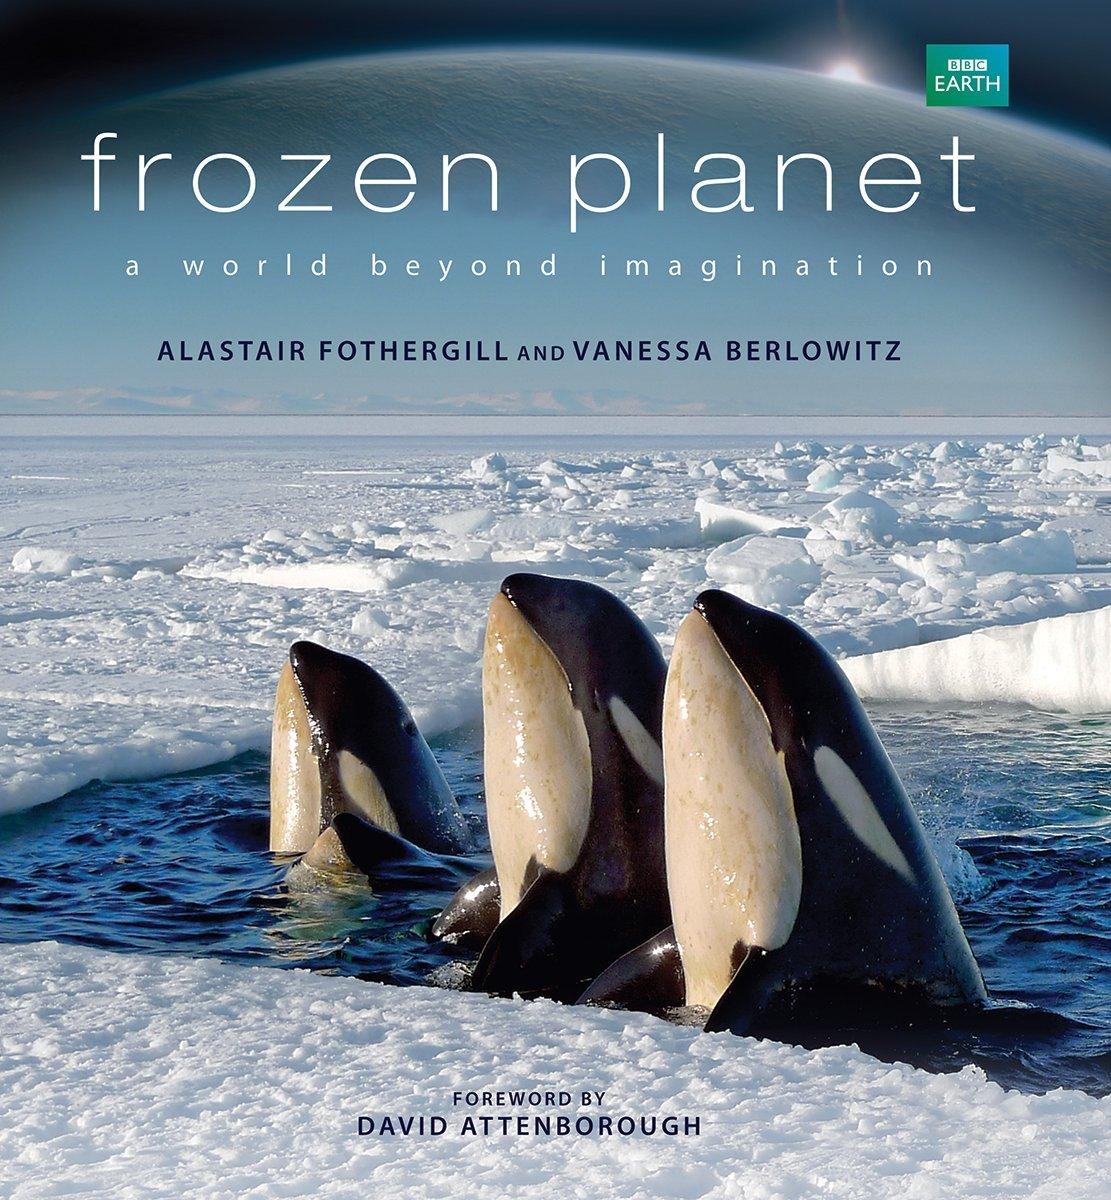 Frozen Planet: A World Beyond Imagination: Fothergill, Alastair, Berlowitz,  Vanessa, Attenborough, David: 8601404414381: Books - Amazon.ca